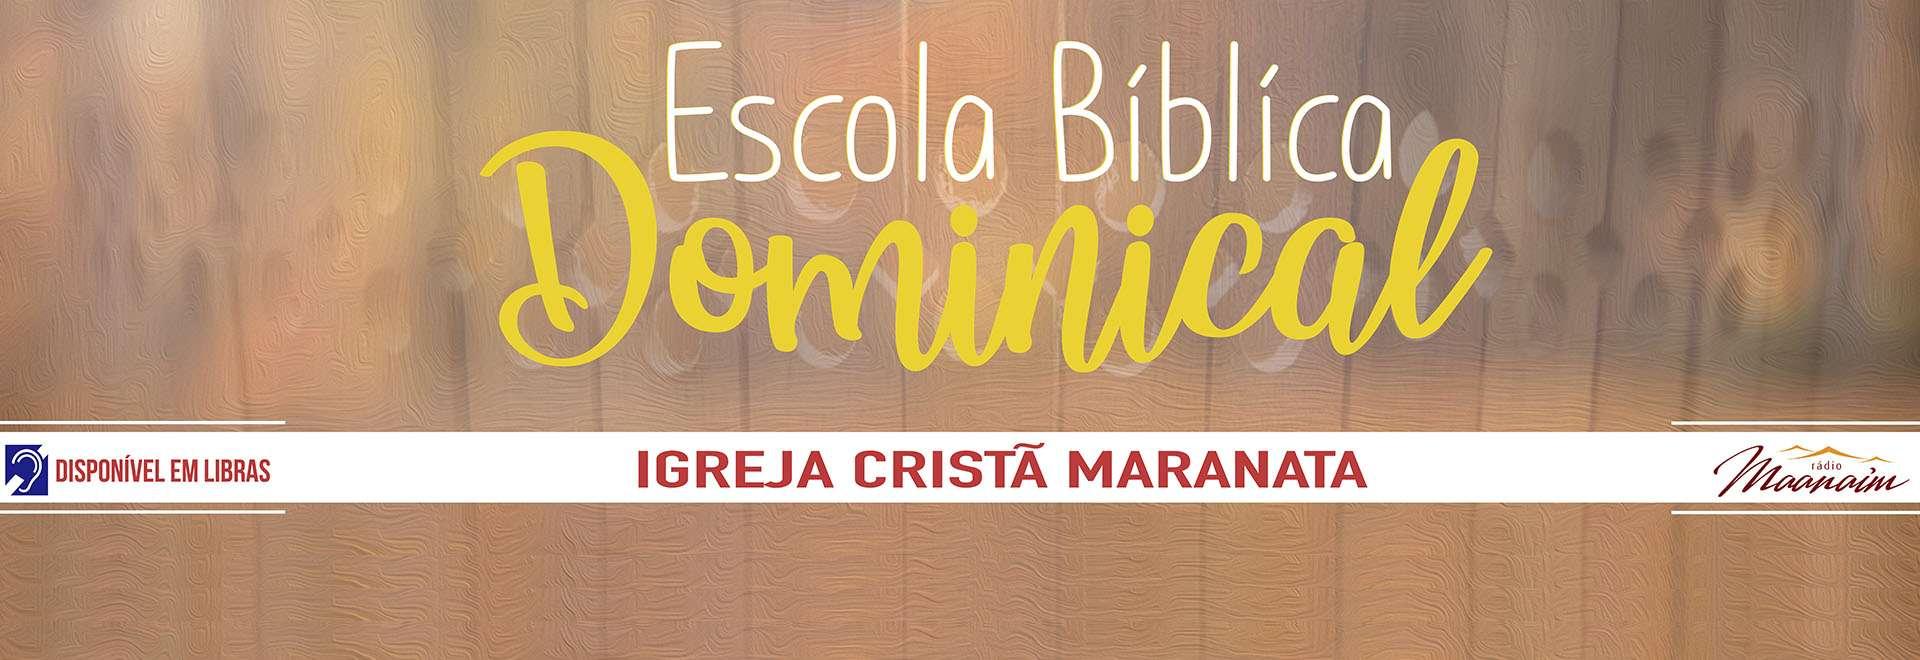 Participações da EBD da Igreja Cristã Maranata - 07/03/2021